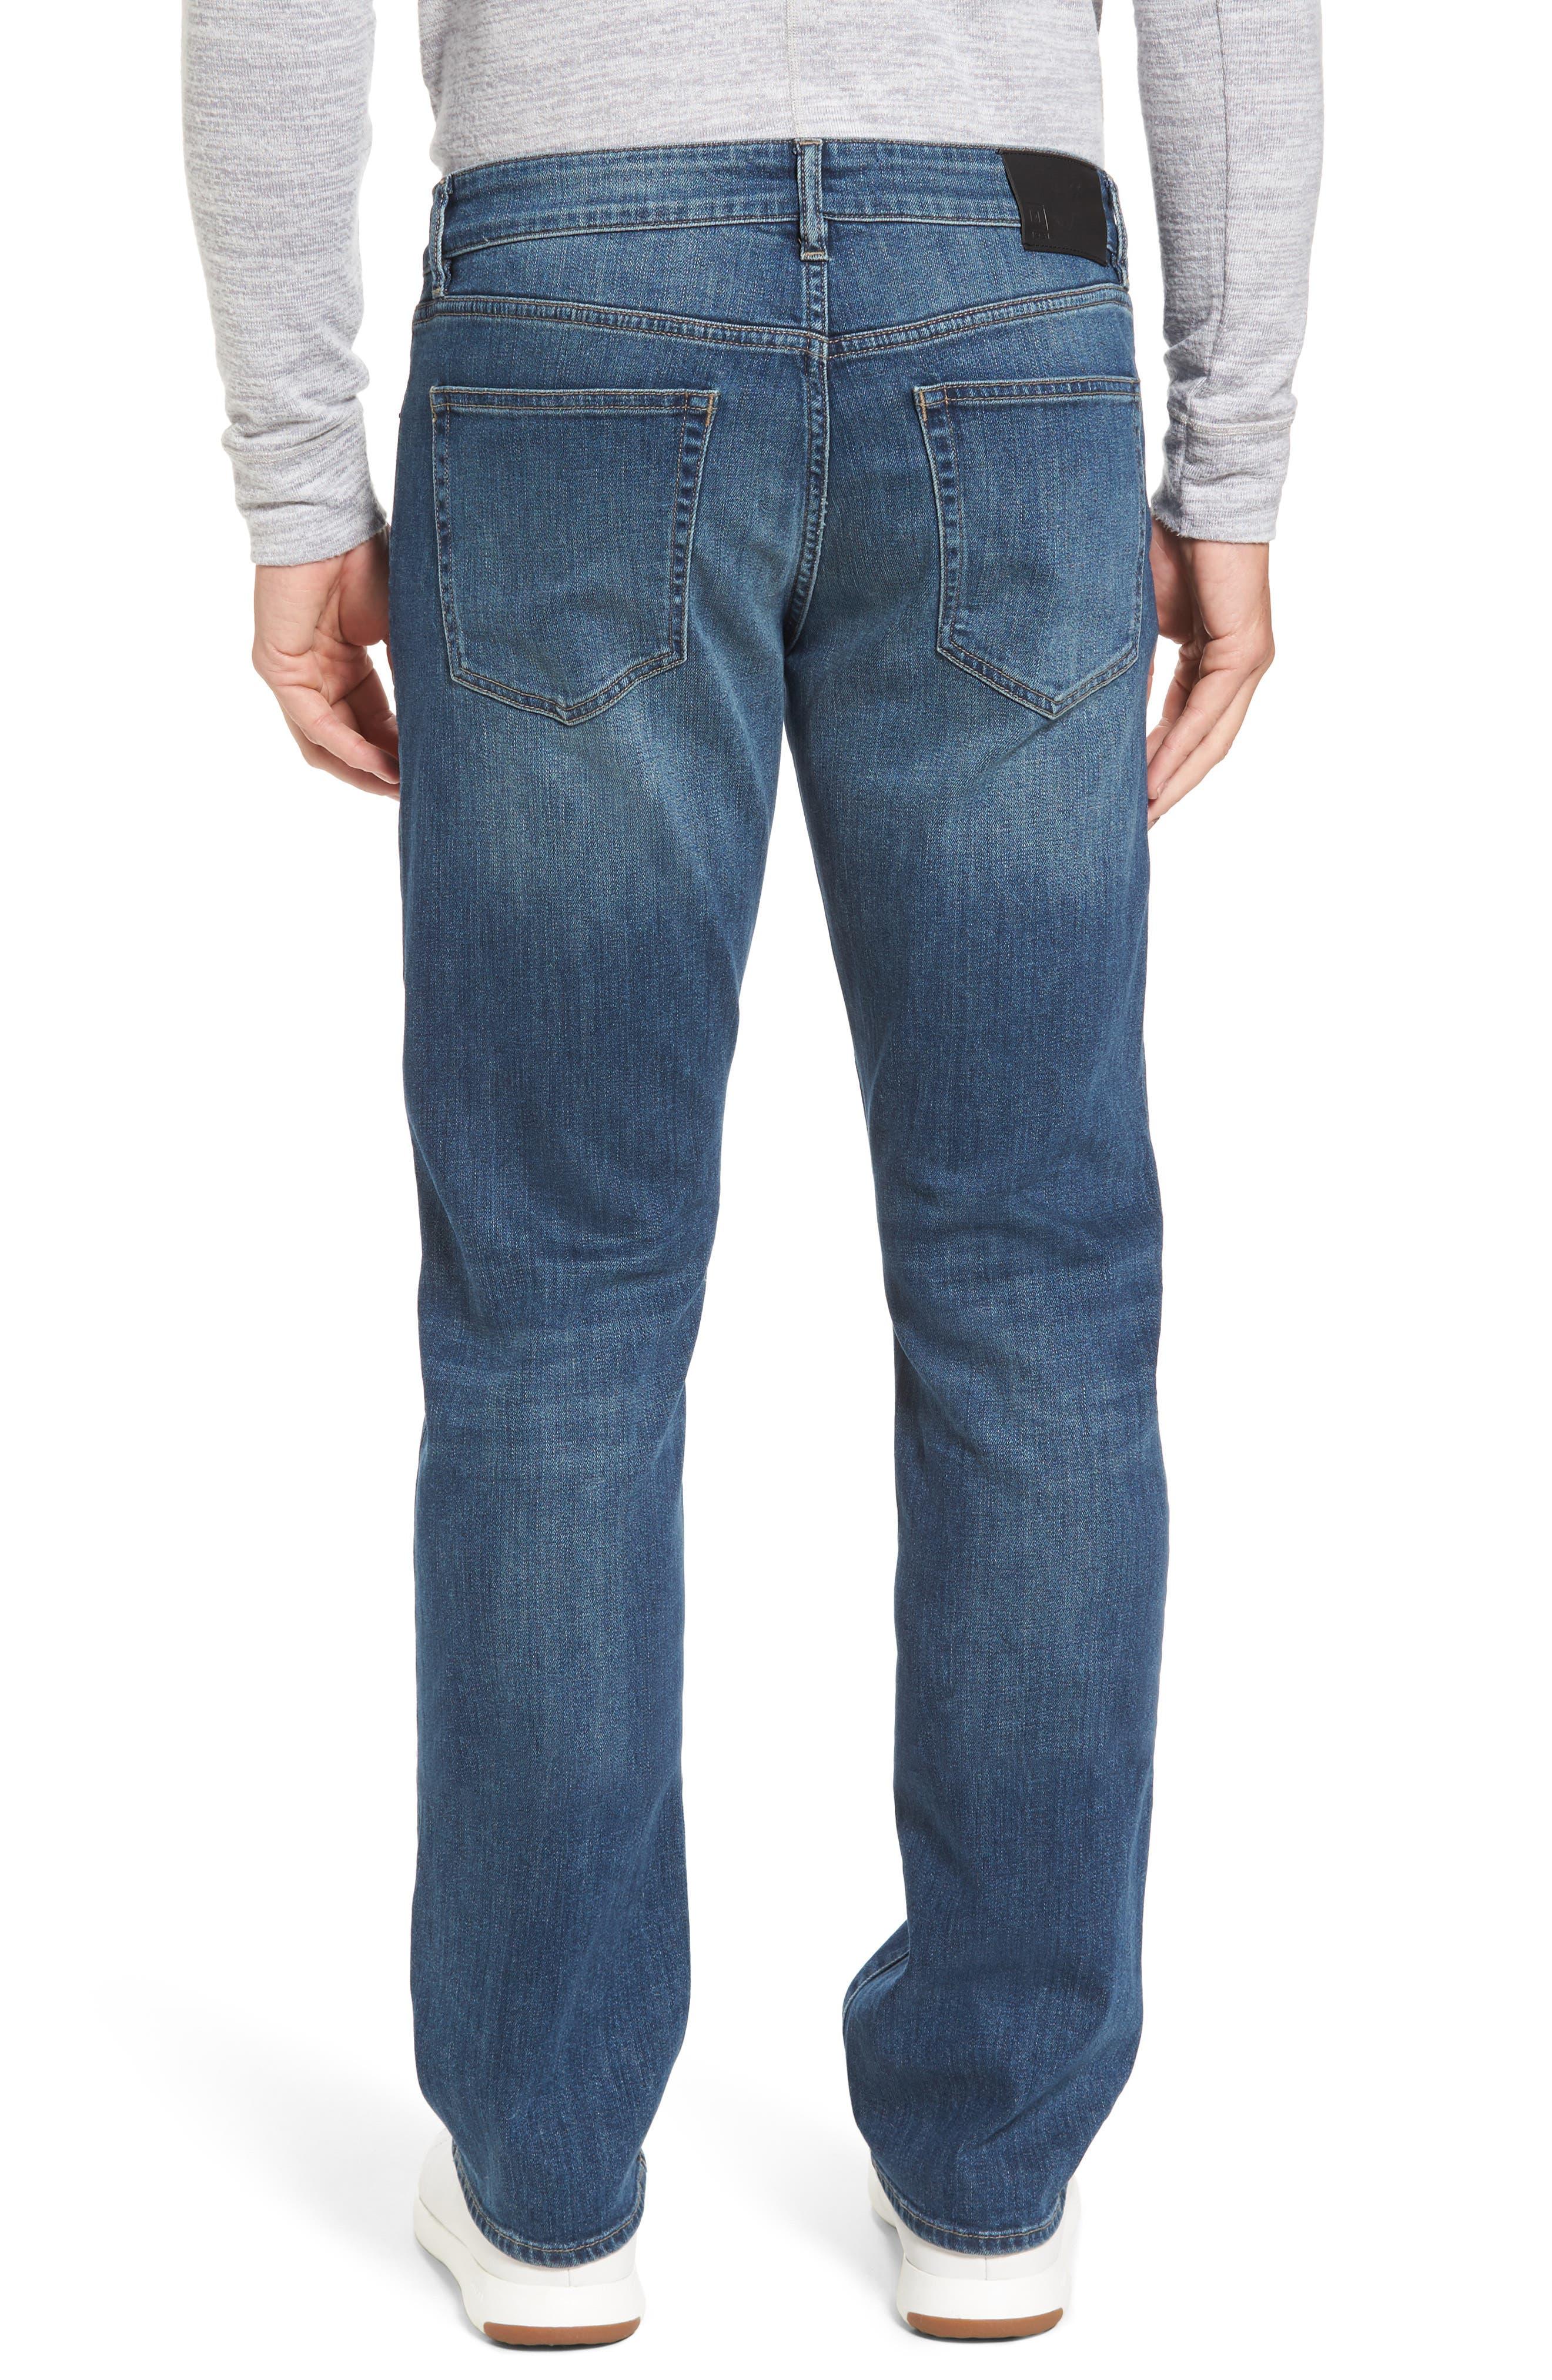 Avery Slim Straight Leg Jeans,                             Alternate thumbnail 2, color,                             Epoxy